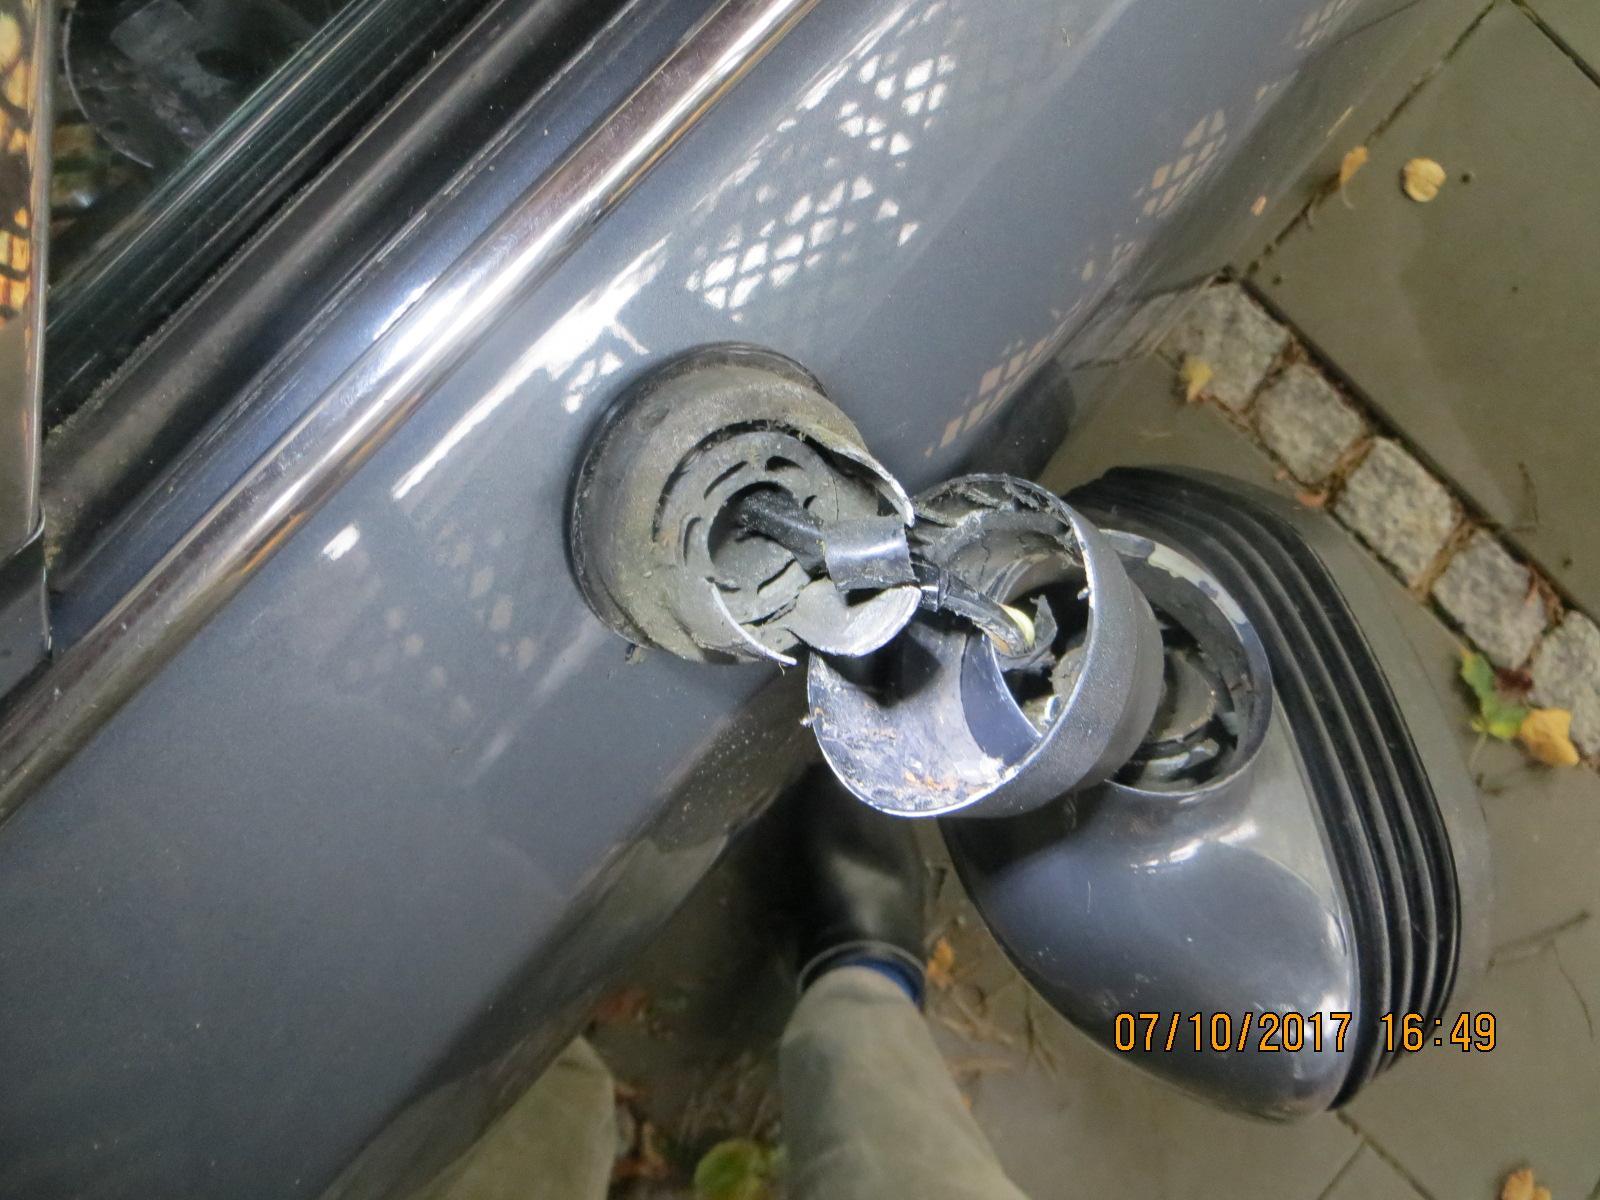 CX_Fahrerspiegel.JPG.cc31cd4ee1dae73d1c381703ed690ff3.JPG